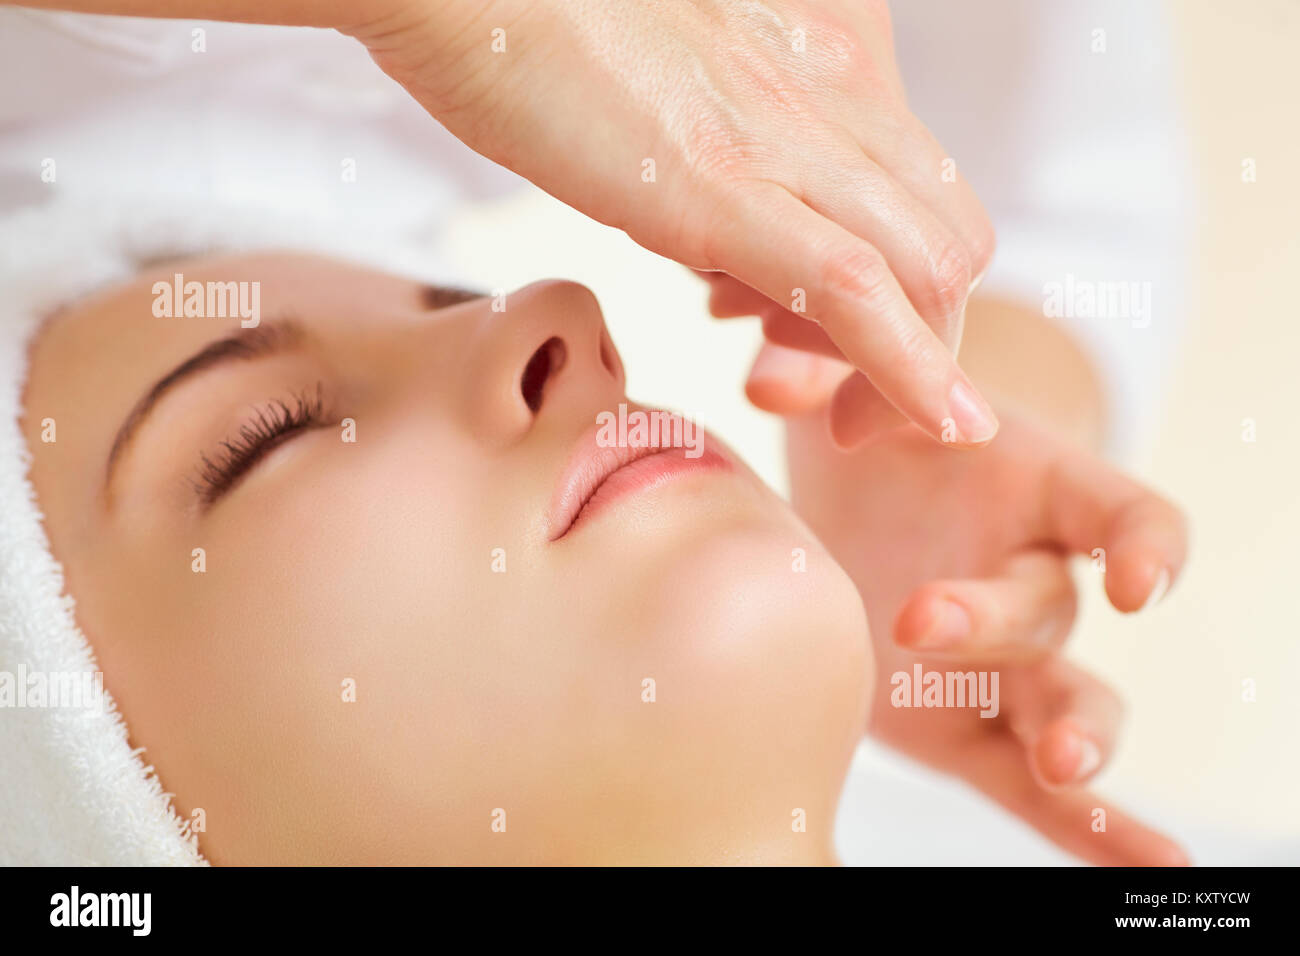 Beautiful woman at a facial massage. - Stock Image